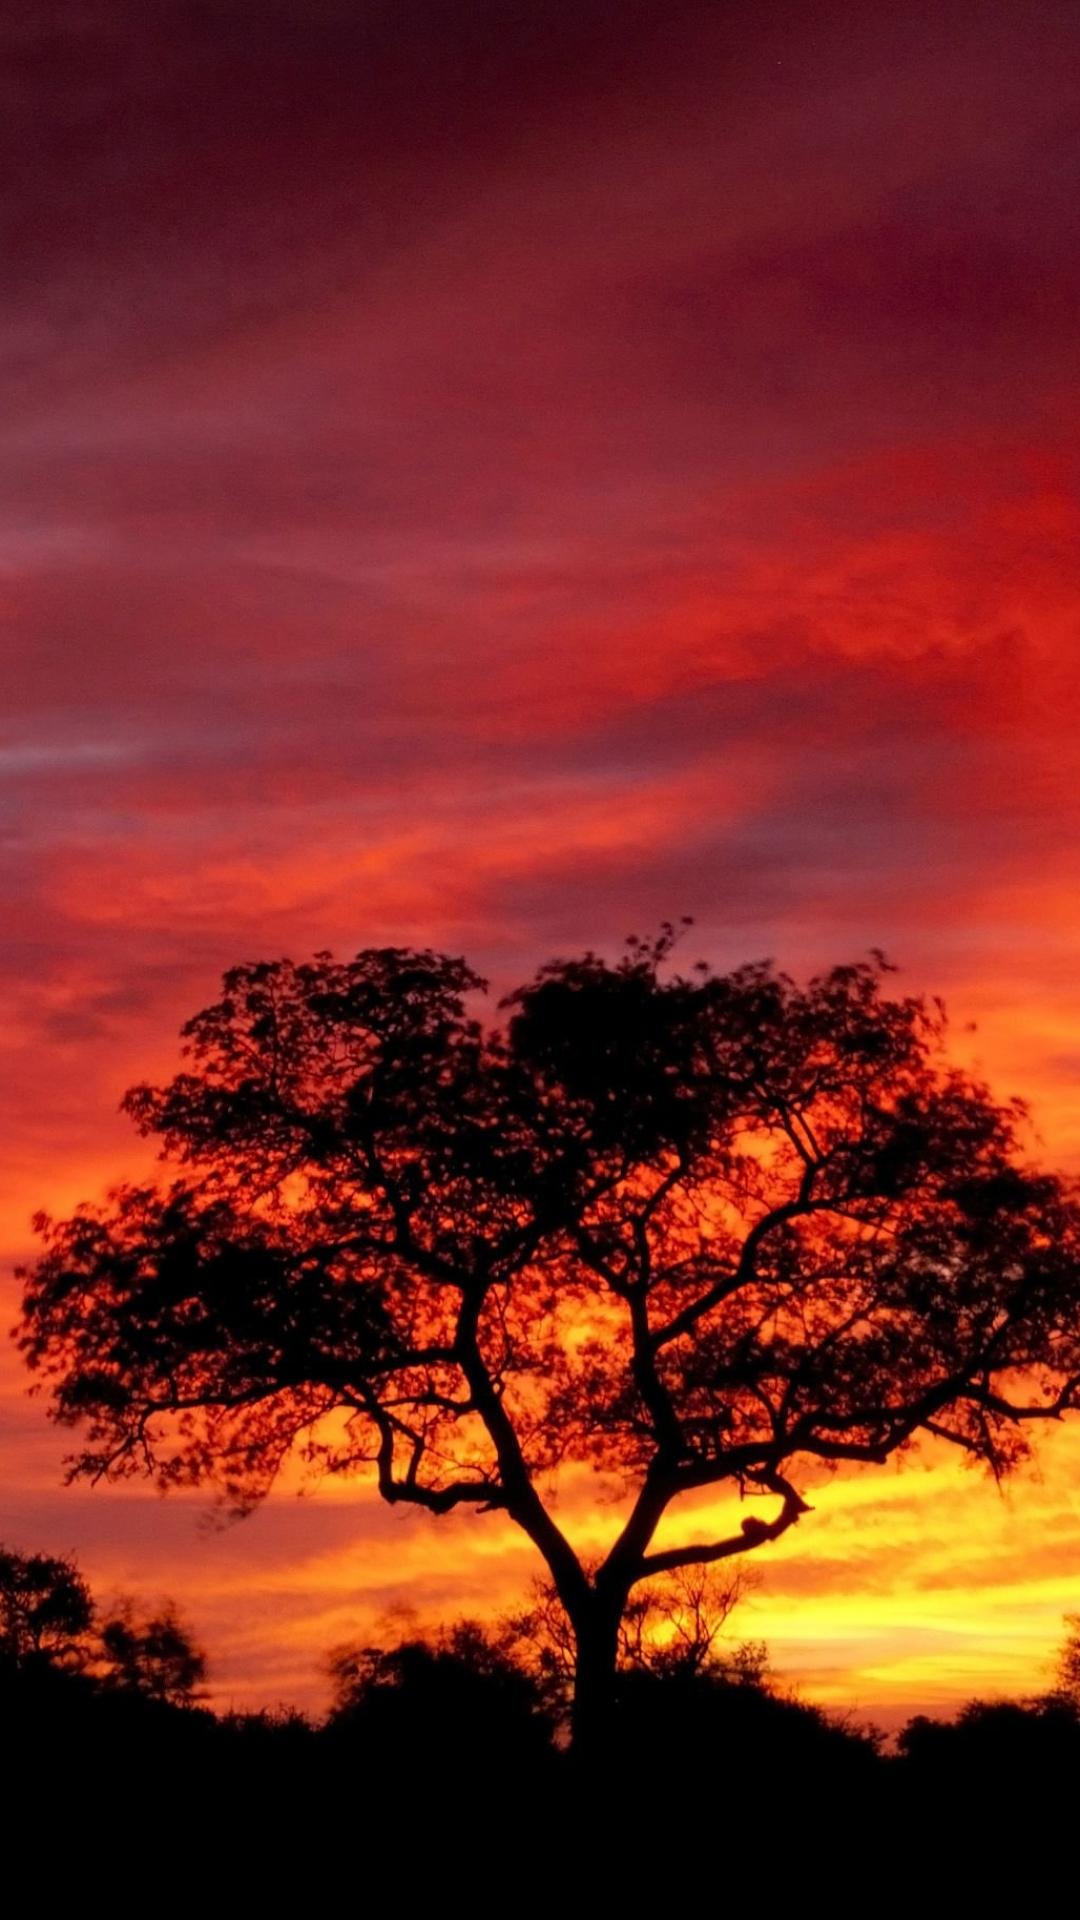 Earth Sunset 1080x1920 Wallpaper ID 621698